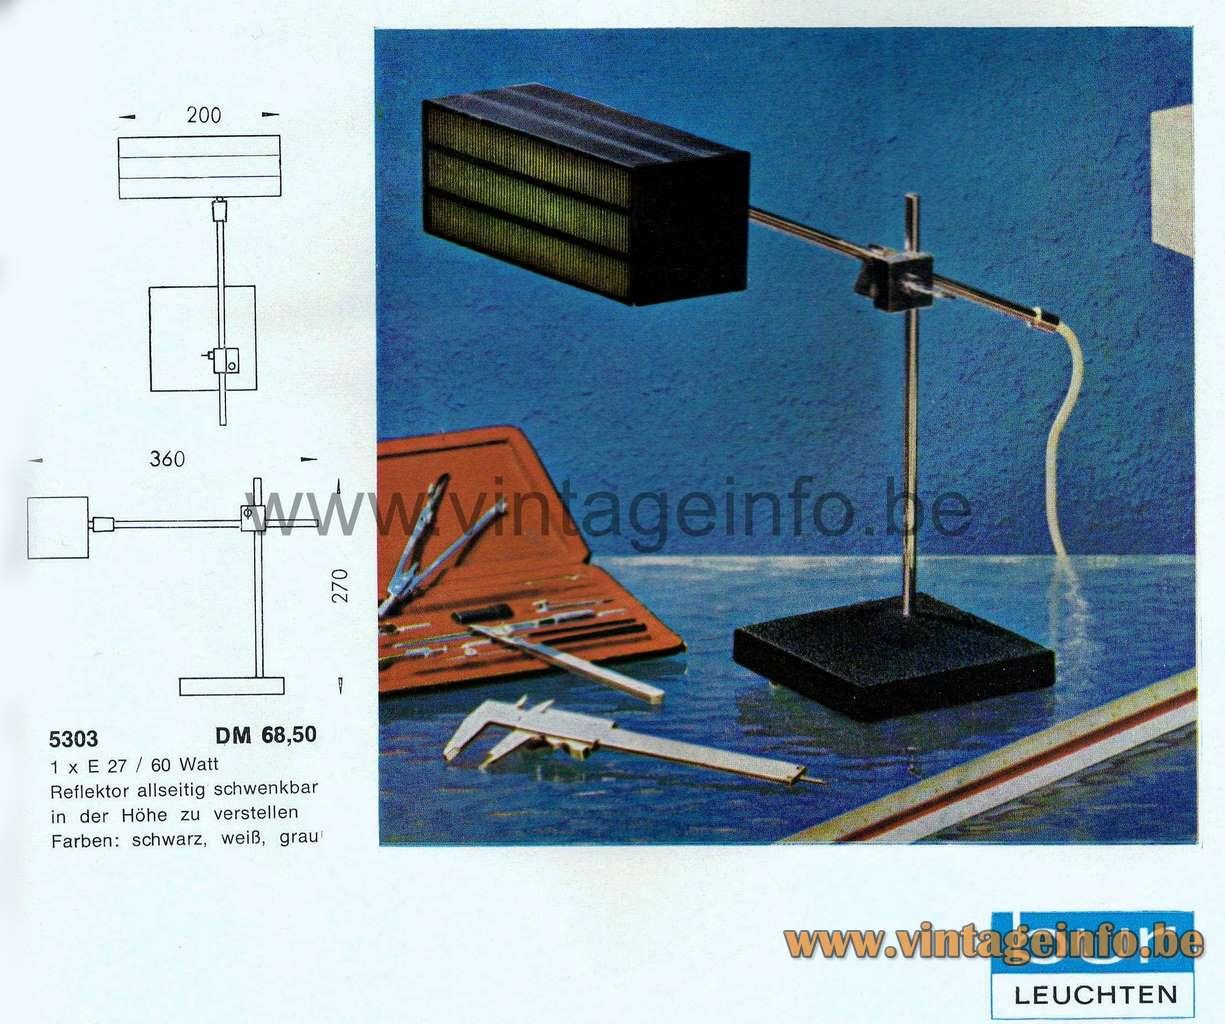 Bünte & Remmler Flamingo desk lamp 1964 Catalogue 1950s 1960s MCM Mid-Century Modern